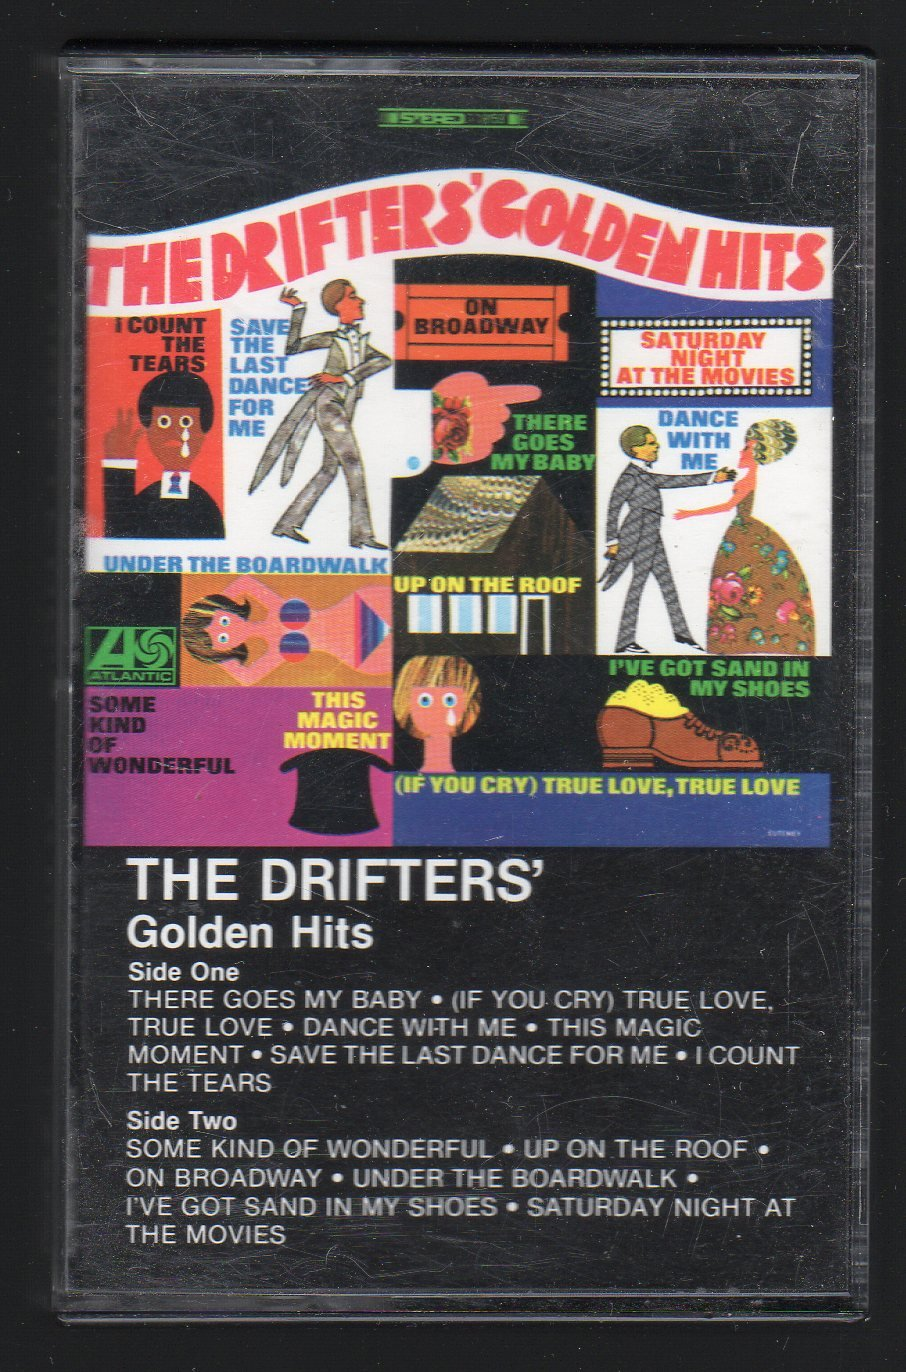 The Drifters - Golden Hits C4 Cassette Tape